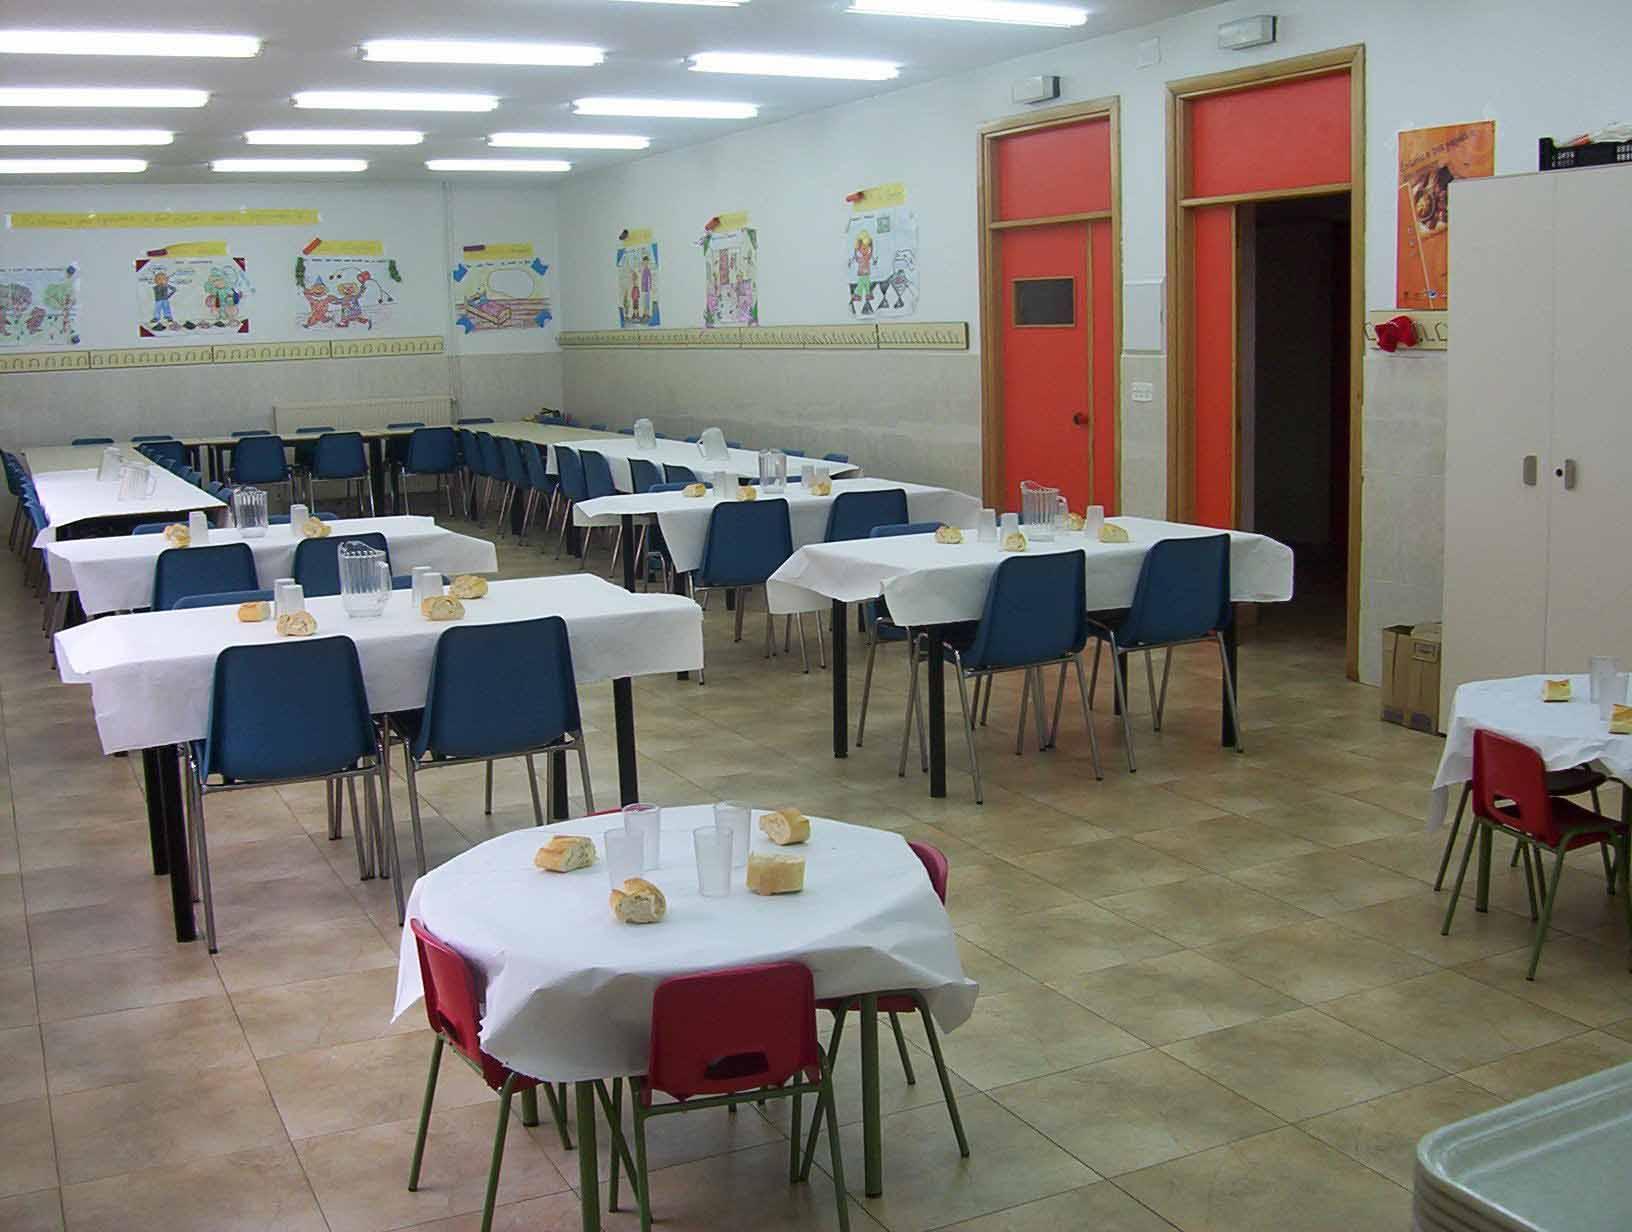 Comedores Jcyl. Curso escolar 2017-2018